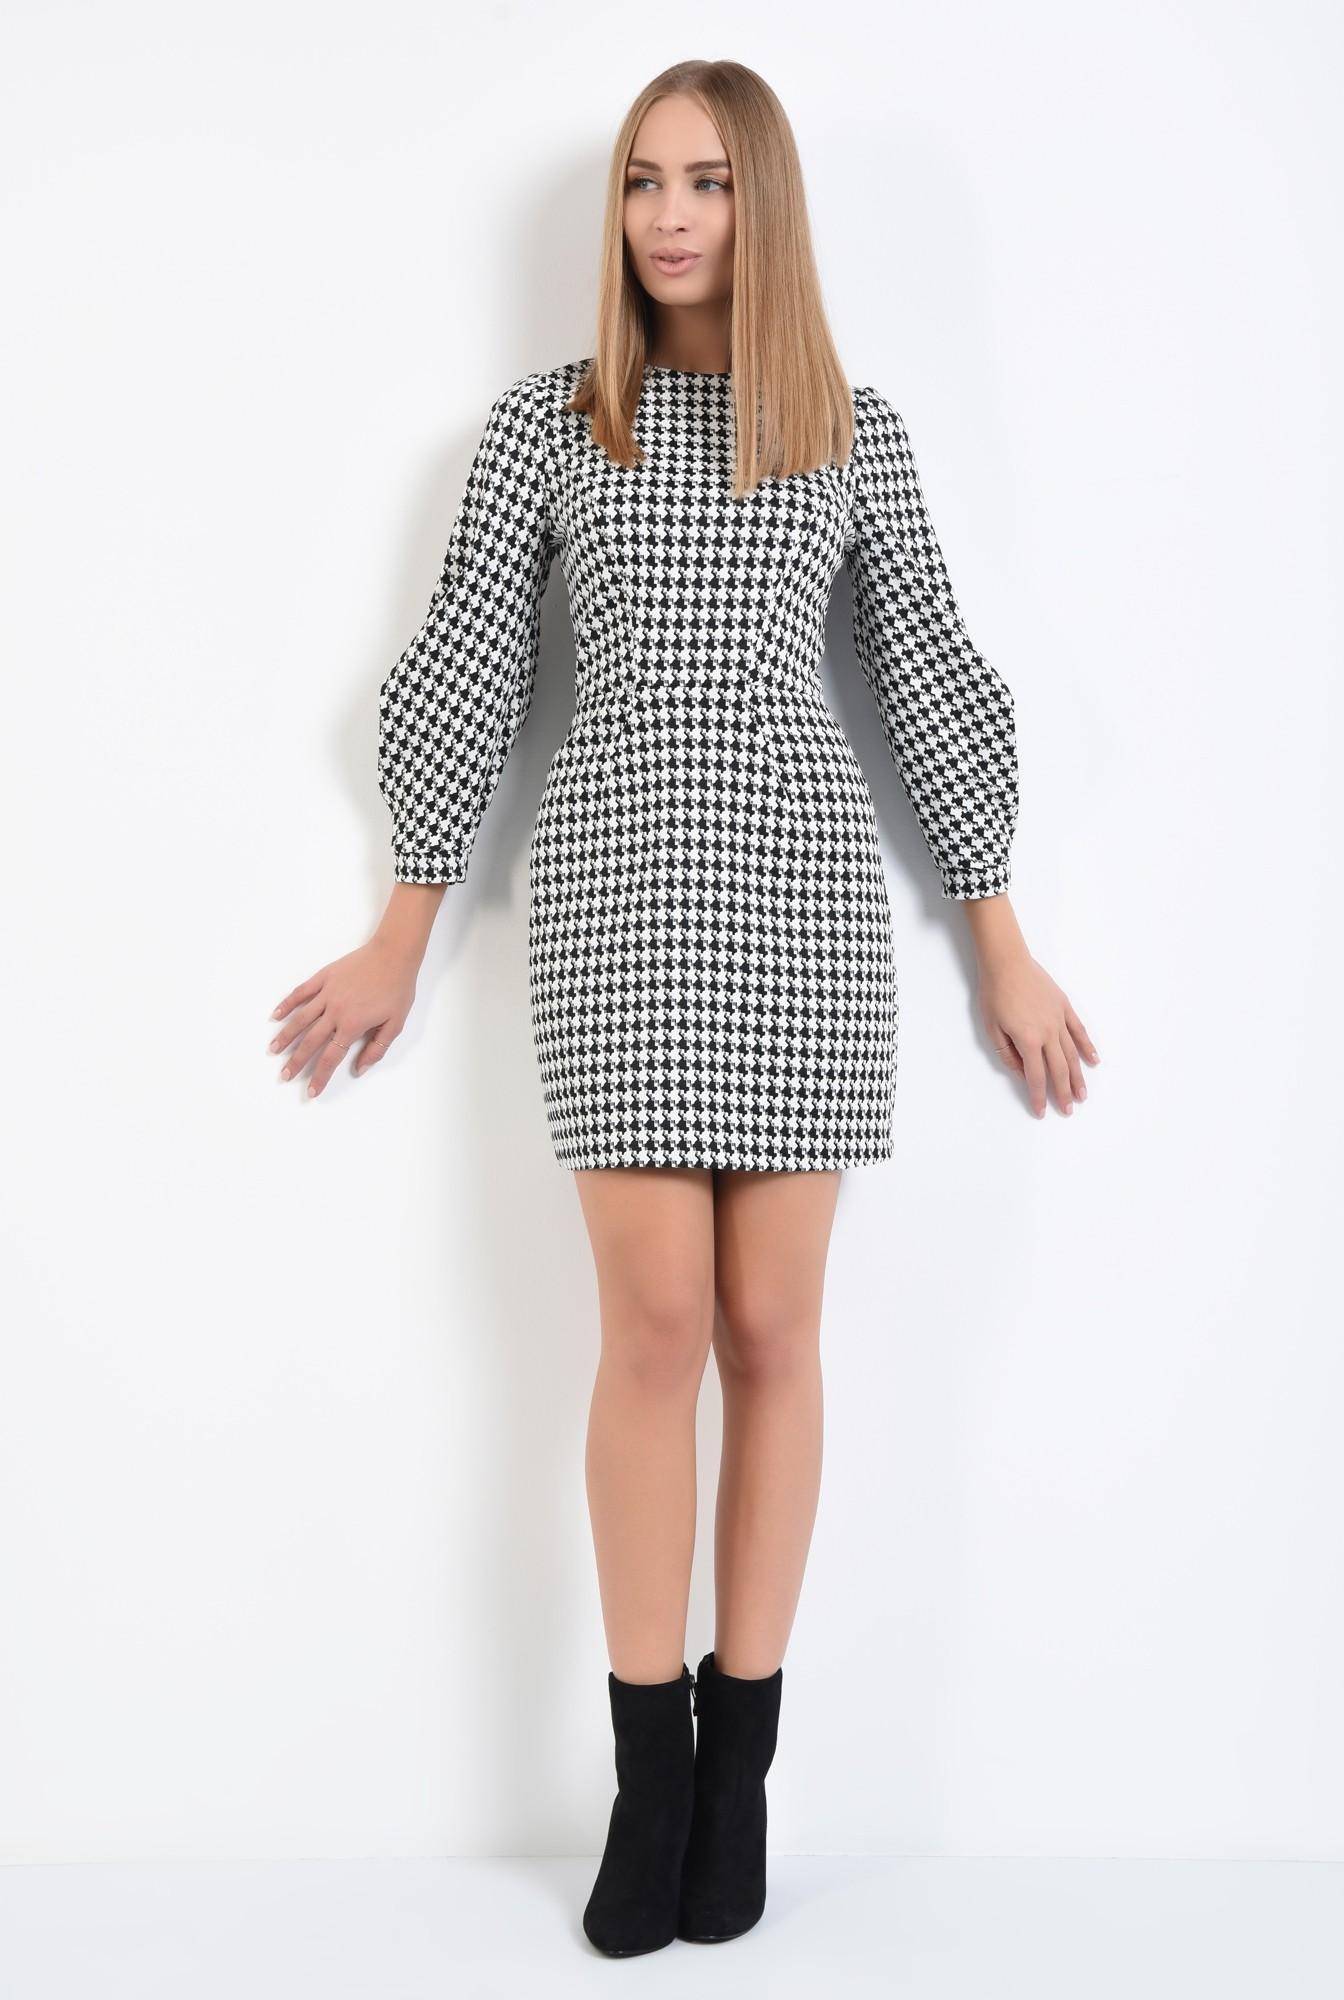 3 - rochie de zi, alb-negru, croi conic, mini